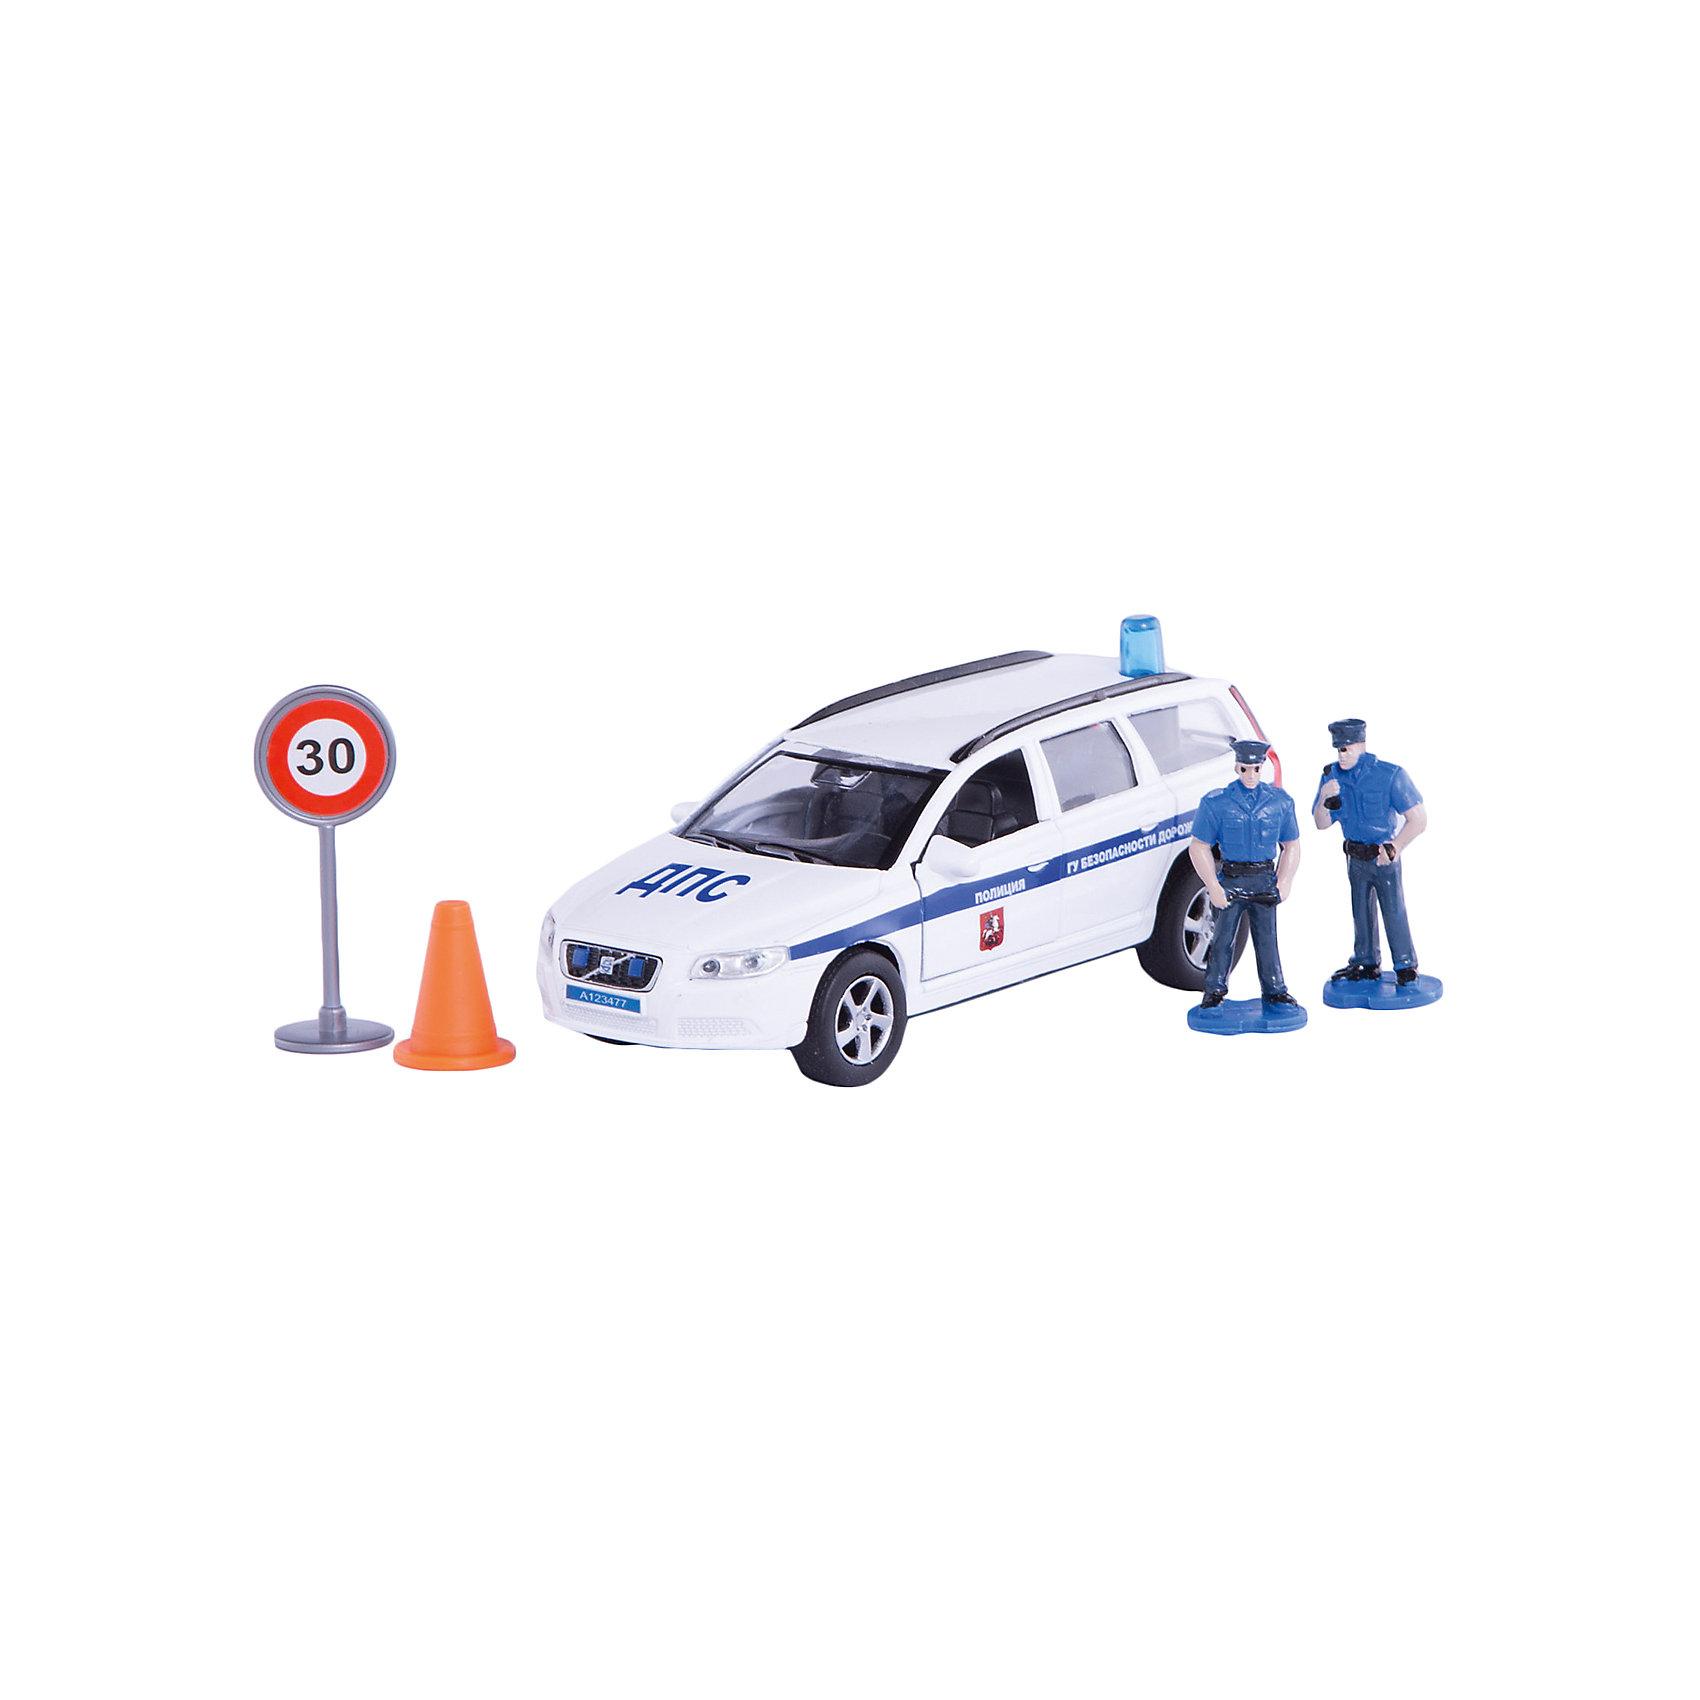 Машина Volvo Полиция ДПС ГУ БДД, 1:32, со светом и звуком, Пламенный мотор<br><br>Ширина мм: 597<br>Глубина мм: 440<br>Высота мм: 343<br>Вес г: 292<br>Возраст от месяцев: 36<br>Возраст до месяцев: 120<br>Пол: Мужской<br>Возраст: Детский<br>SKU: 5032595